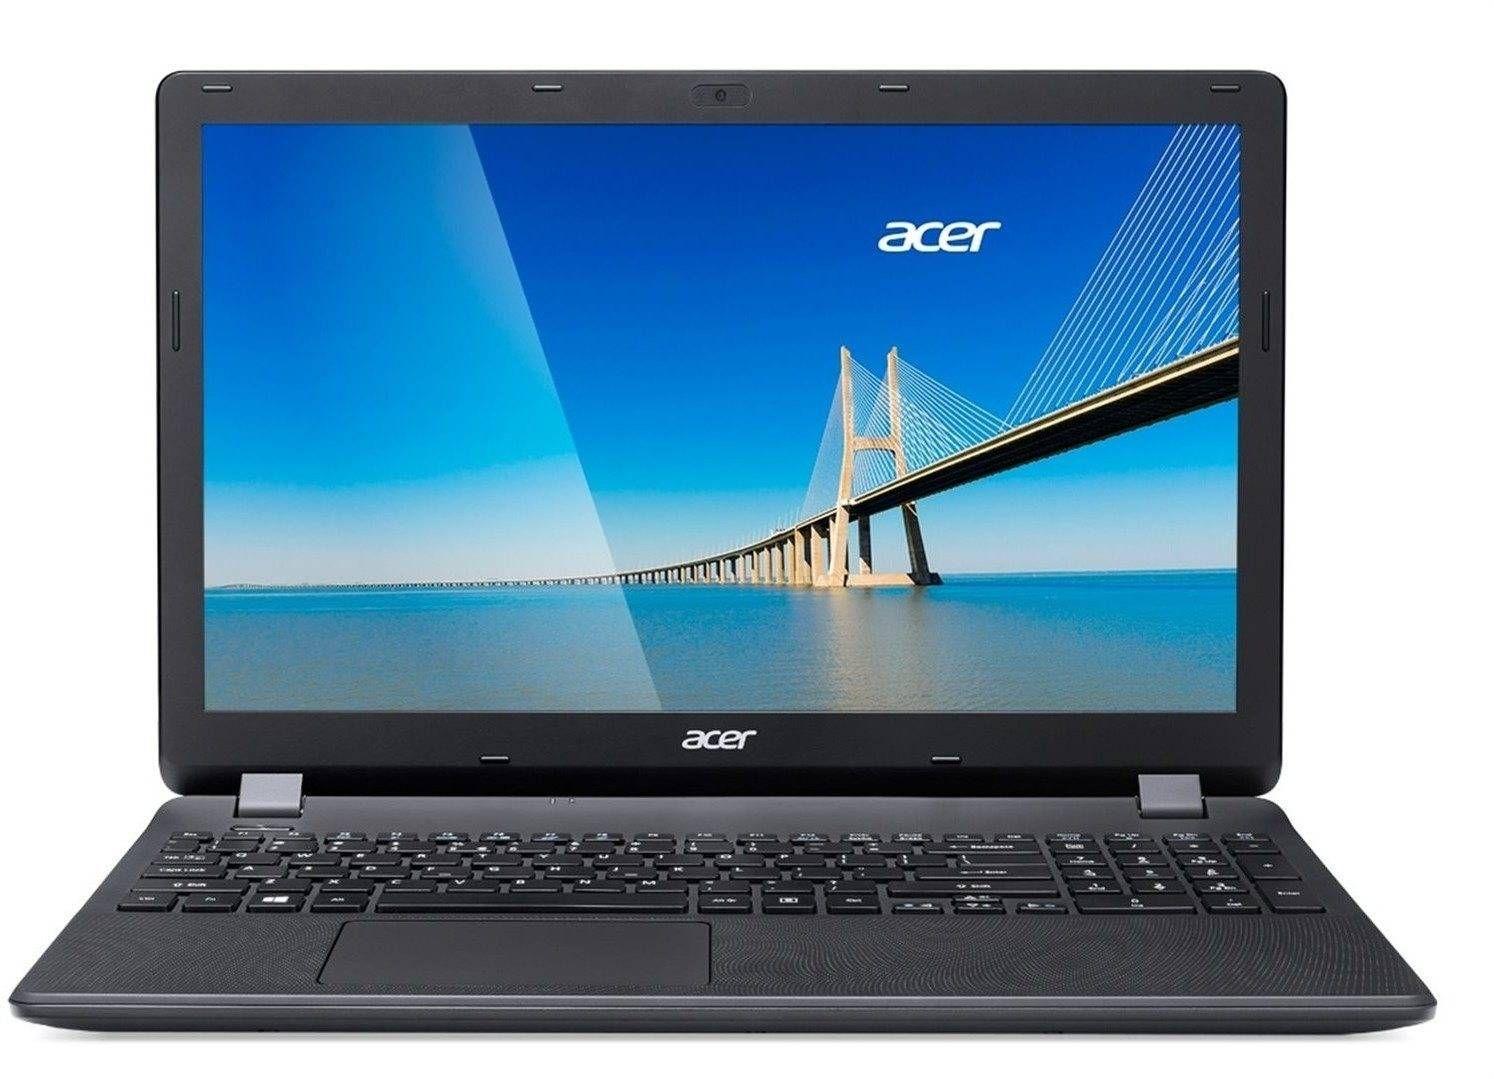 Acer Extensa 15 Ex2519 C4u0 Celeron 4gb 500gb Dos Black Laptop Apple Macbook Mjy42 Notebook Gray Intel Core M 8gb 512gb 12inch Store